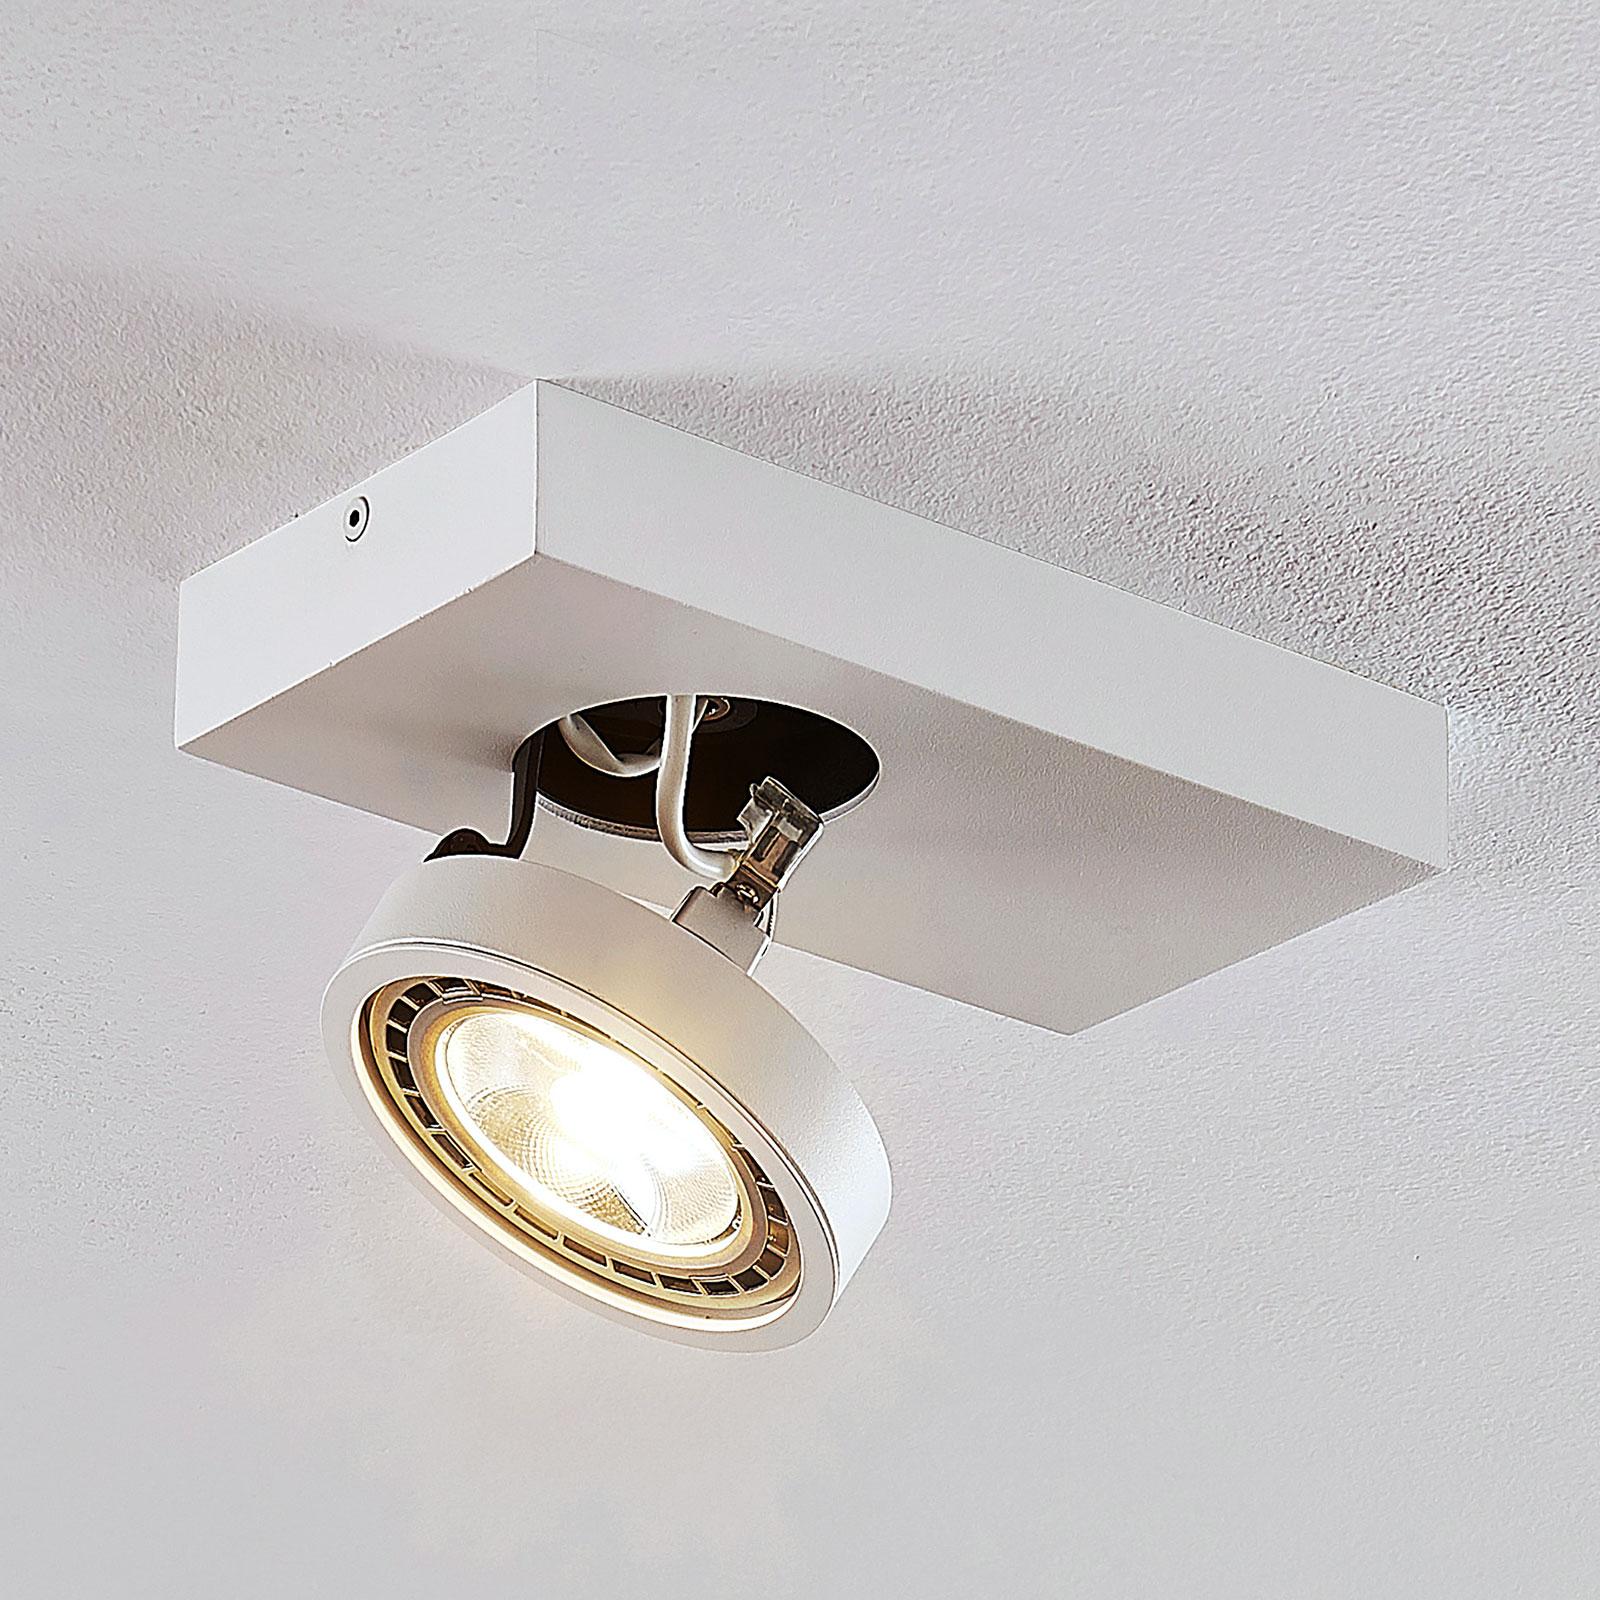 Lampa sufitowa LED Negan biała, 1-punktowa